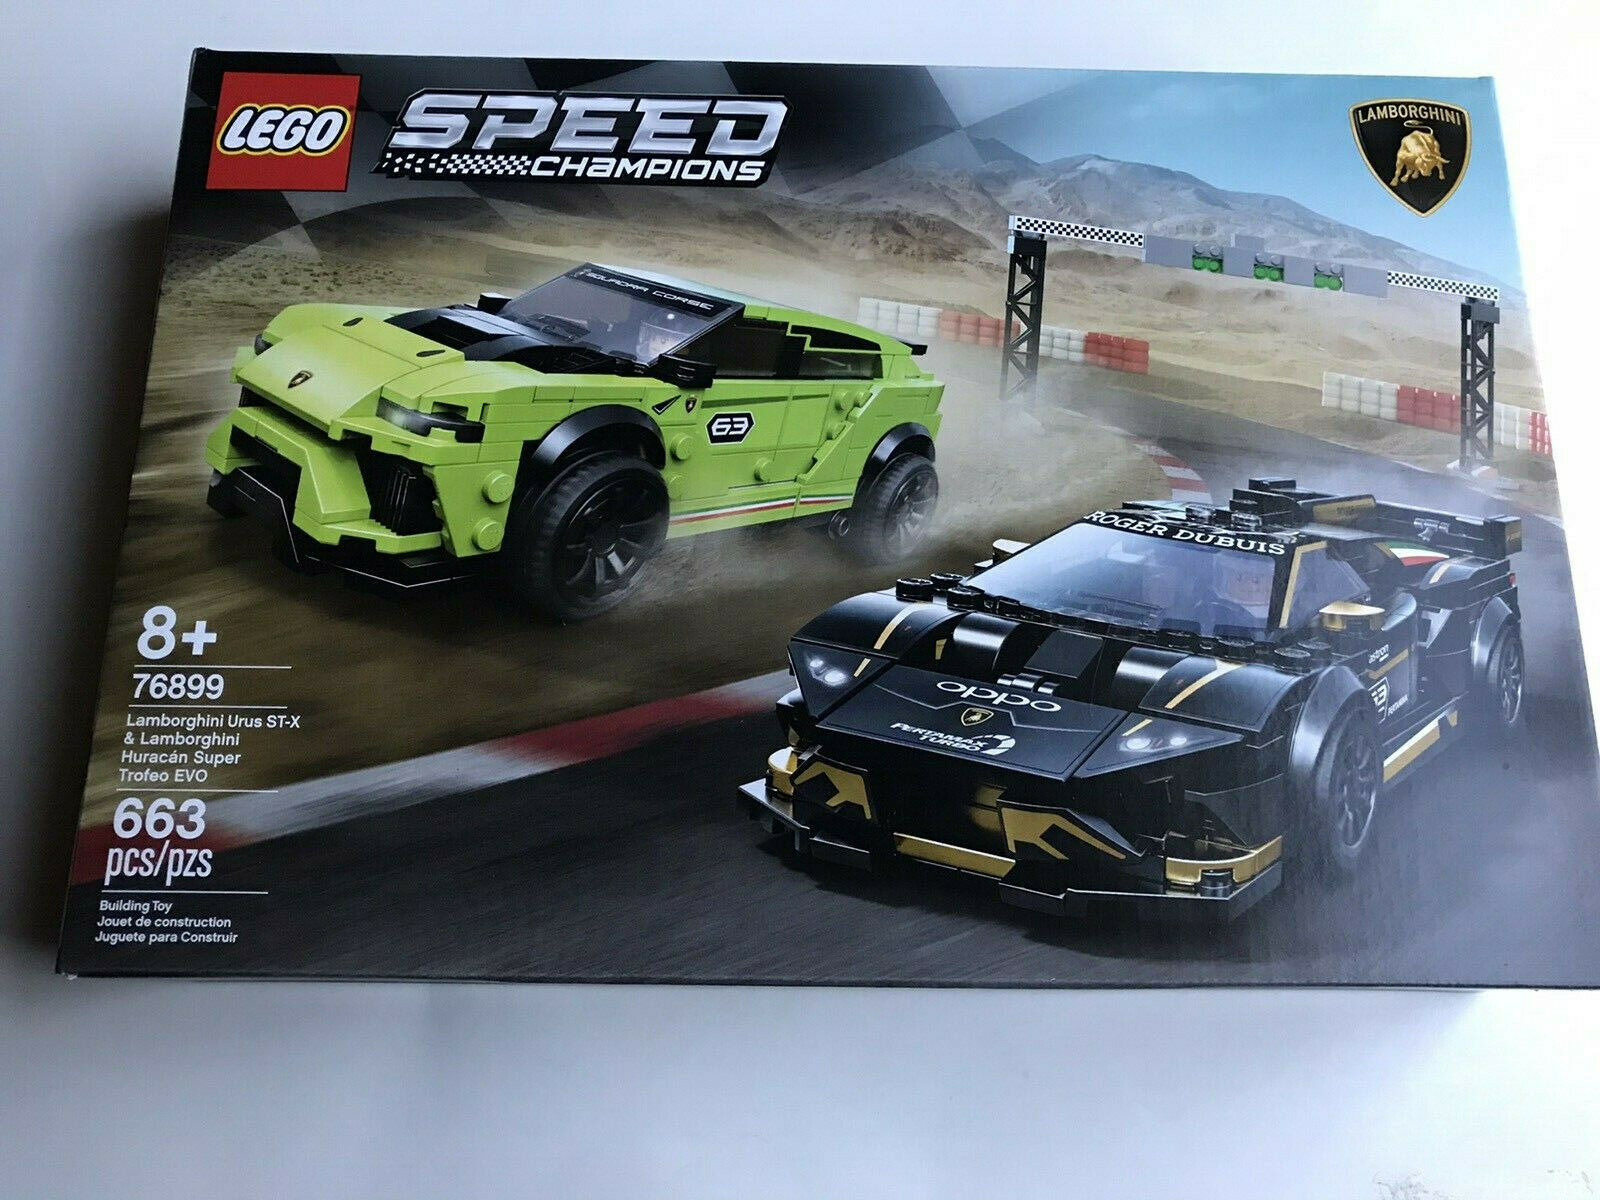 NEW LEGO 76899 Lambo Urus ST-XL & Huracan Sealed Box